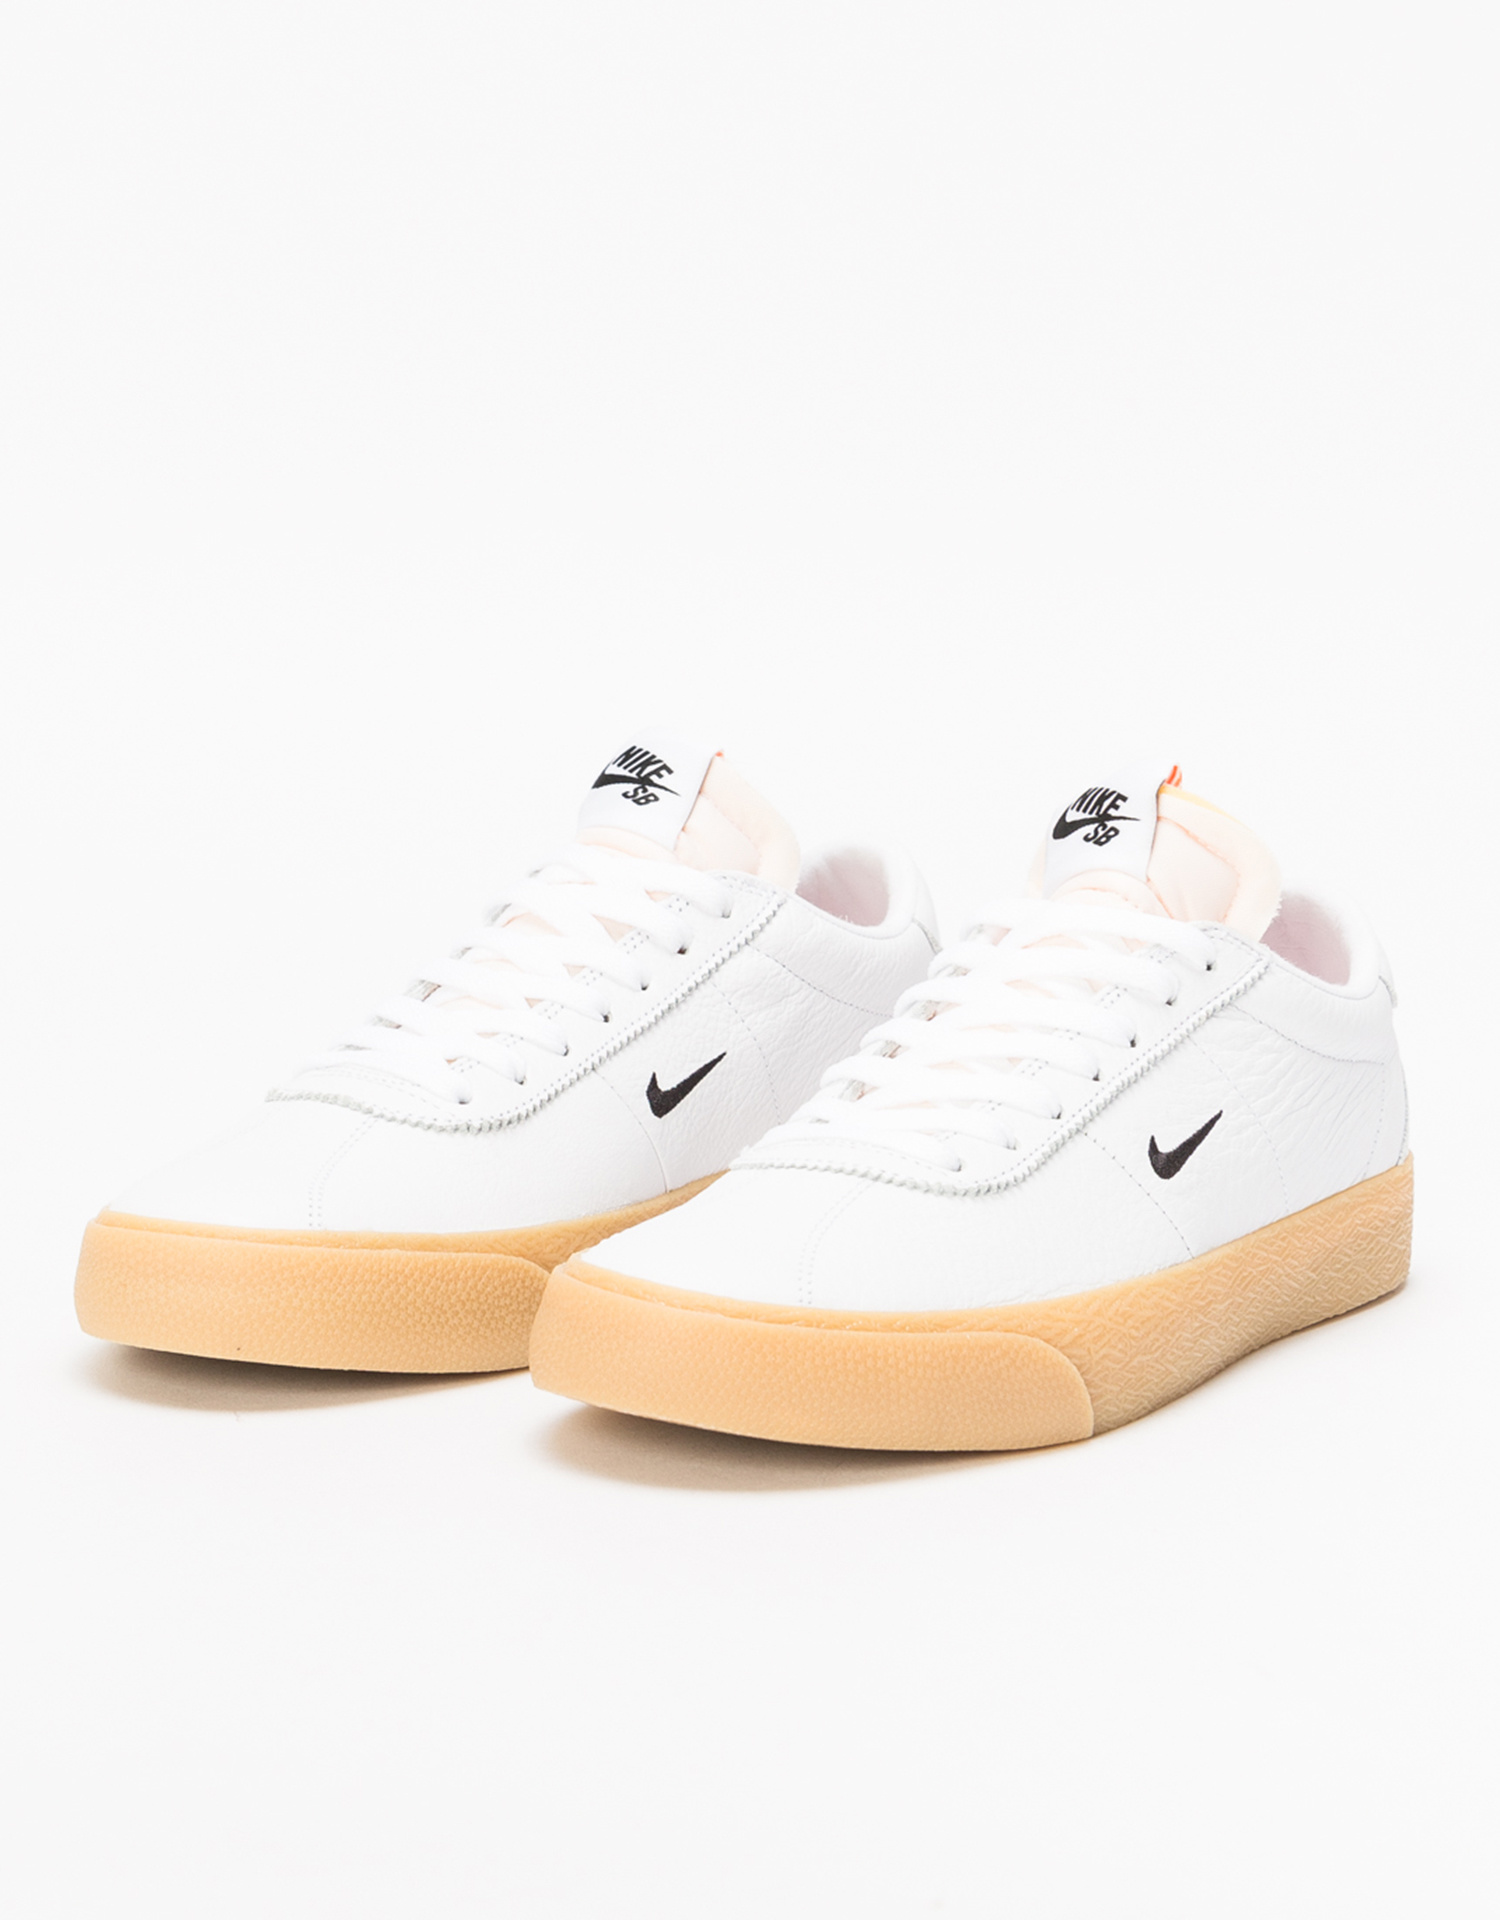 best website 26fc6 73093 Nike SB Zoom Bruin Iso Orange Label White Black-Safety Orange - Lockwood  Skateshop